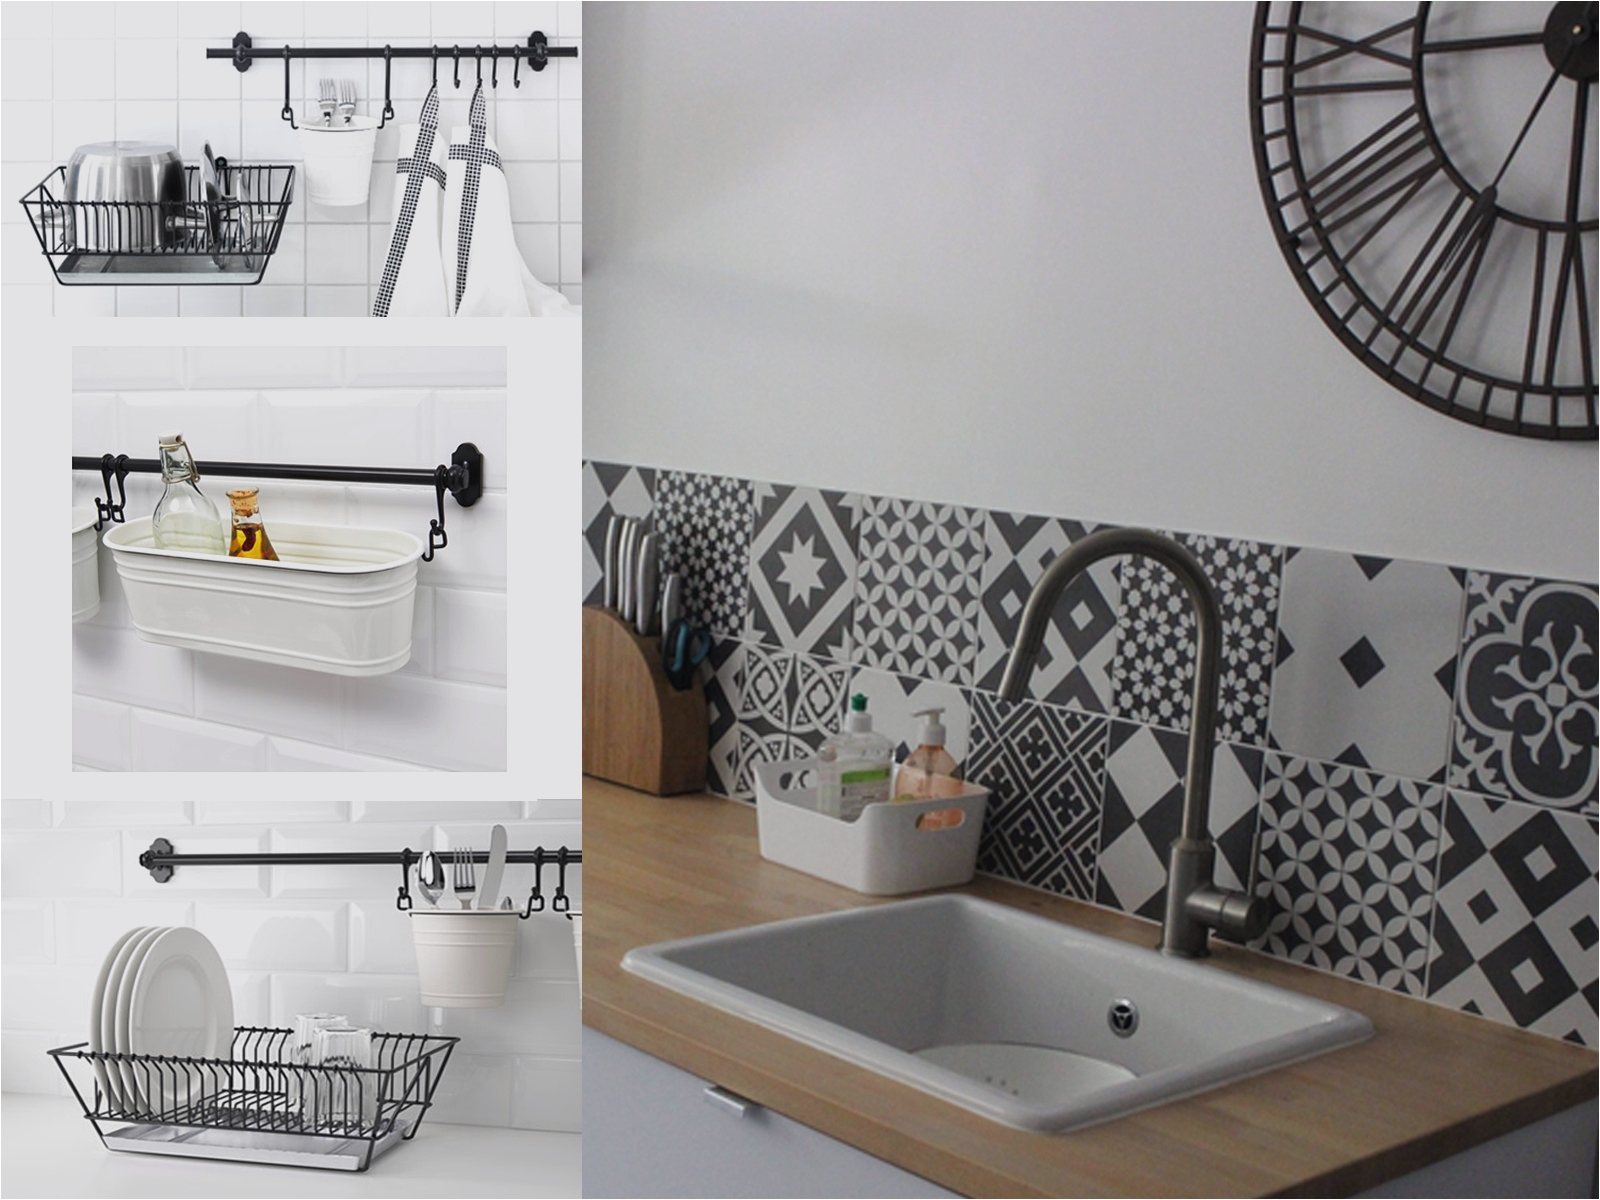 Canapé Stockholm Ikea Occasion Inspirant Photos Admiré Ikea Evier Cuisine